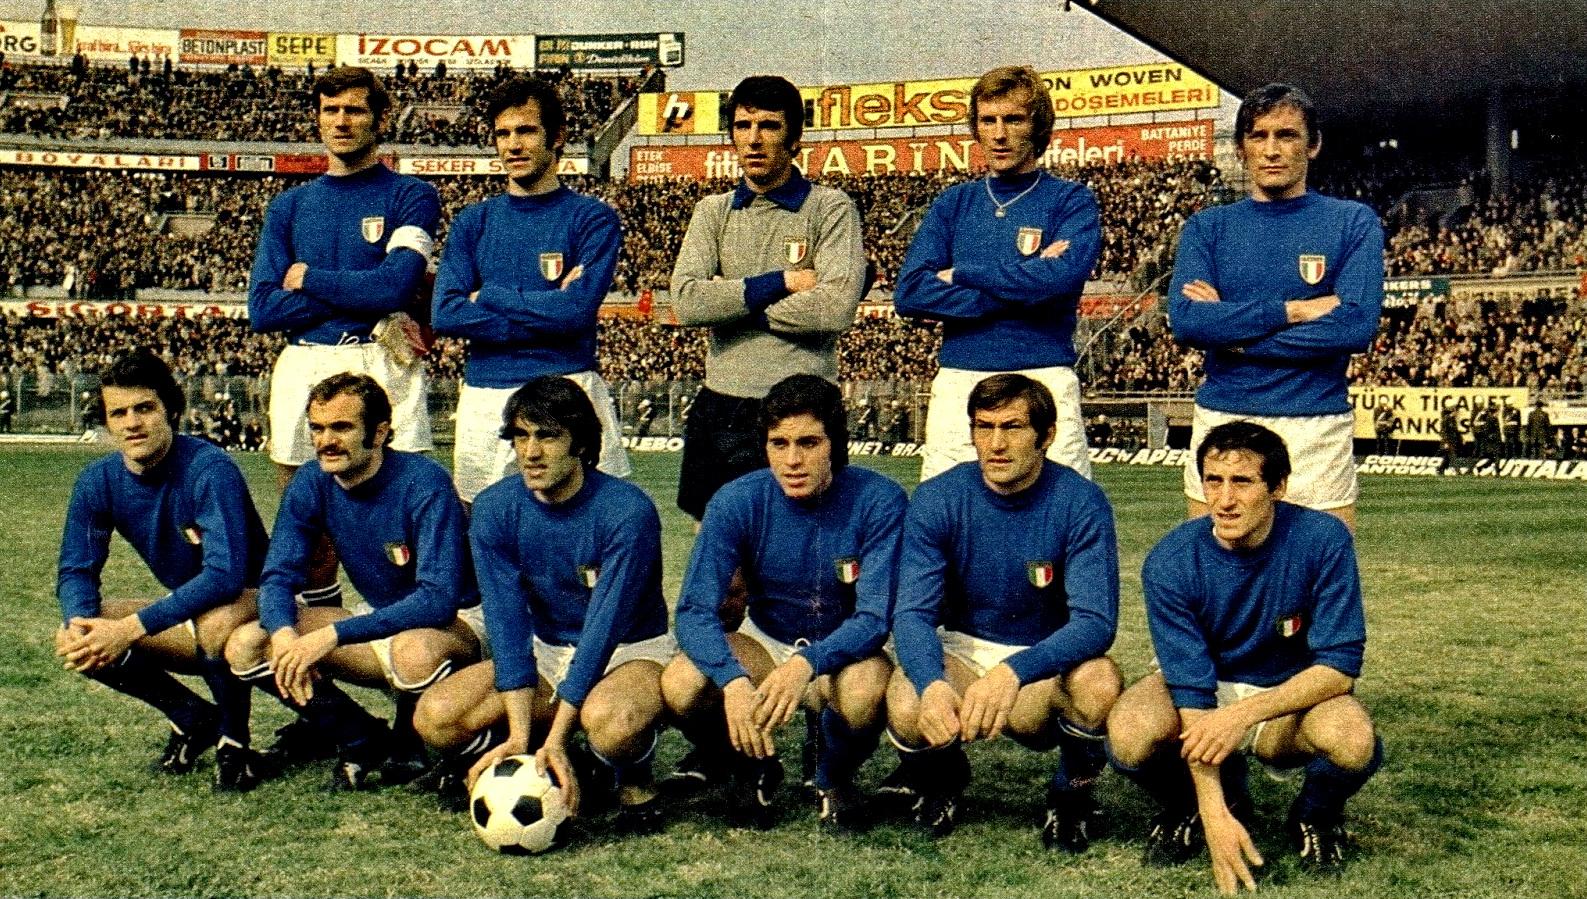 EQUIPOS DE FšTBOL ITALIA Selecci³n 1970 2020